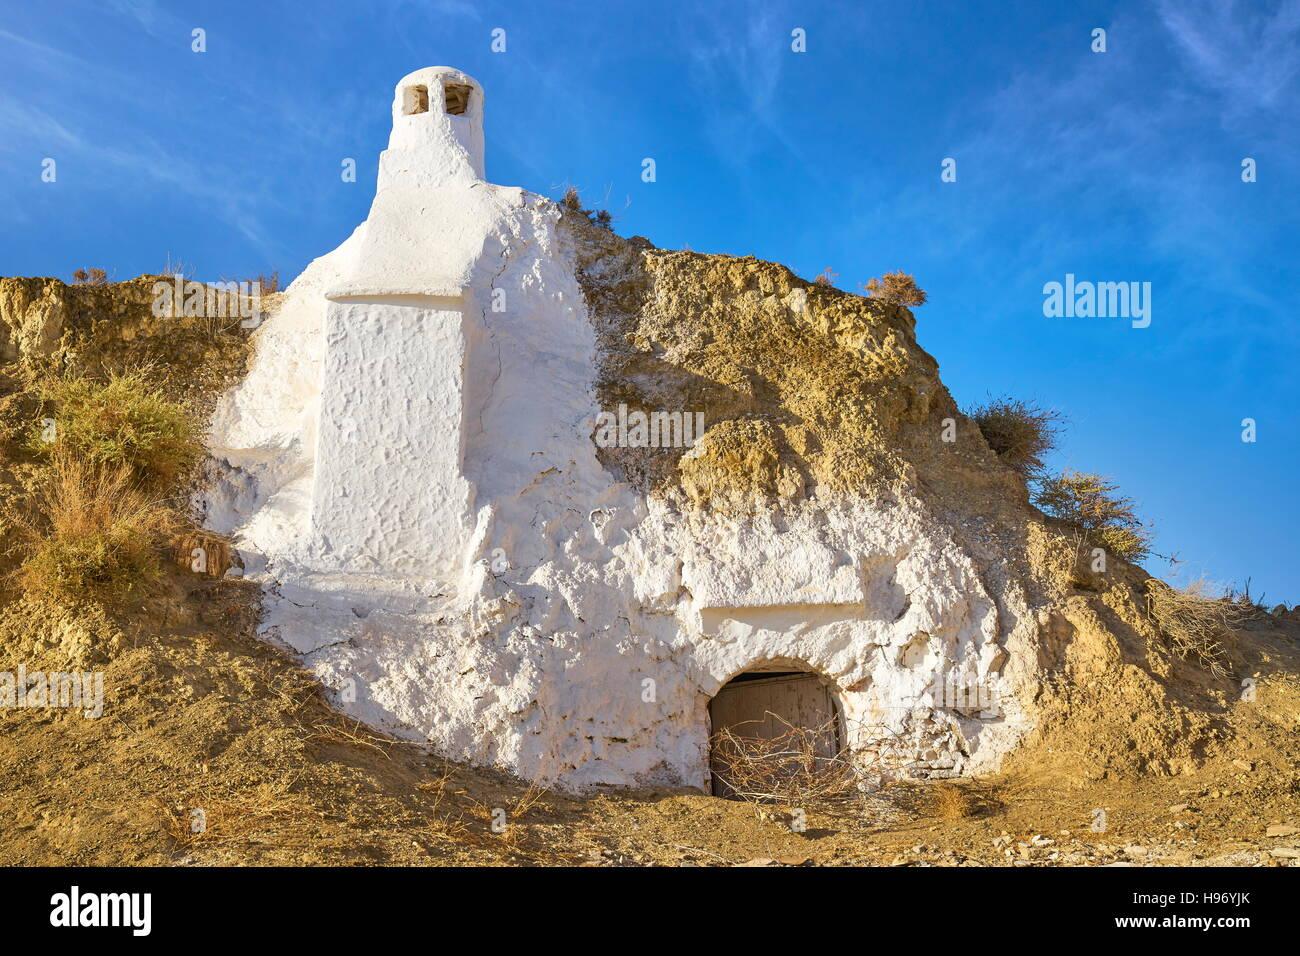 Troglodytes troglodytes, maisons,undergroung Guadix, Andalousie, Espagne Photo Stock